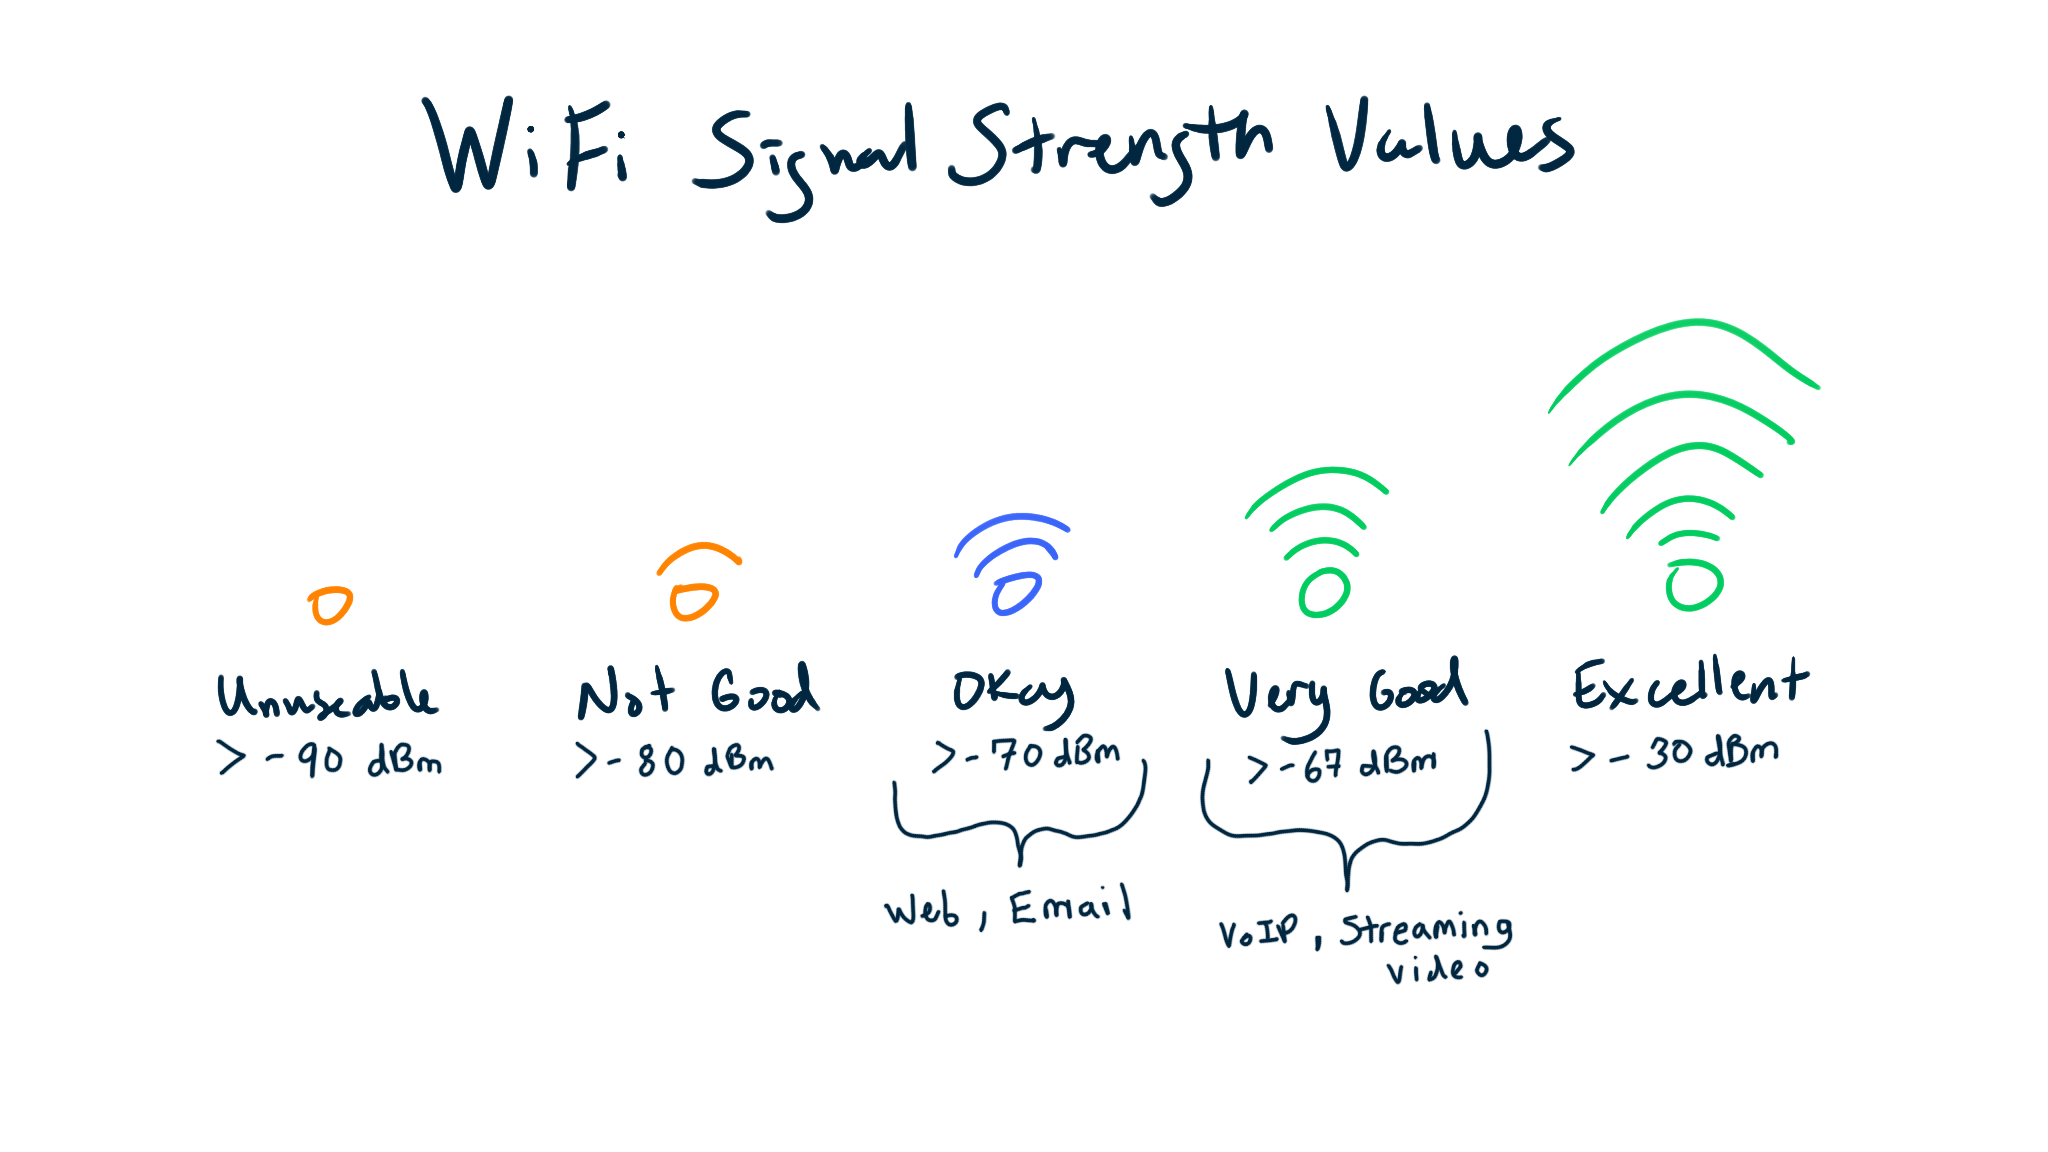 WiFi Signal Strength Values-2